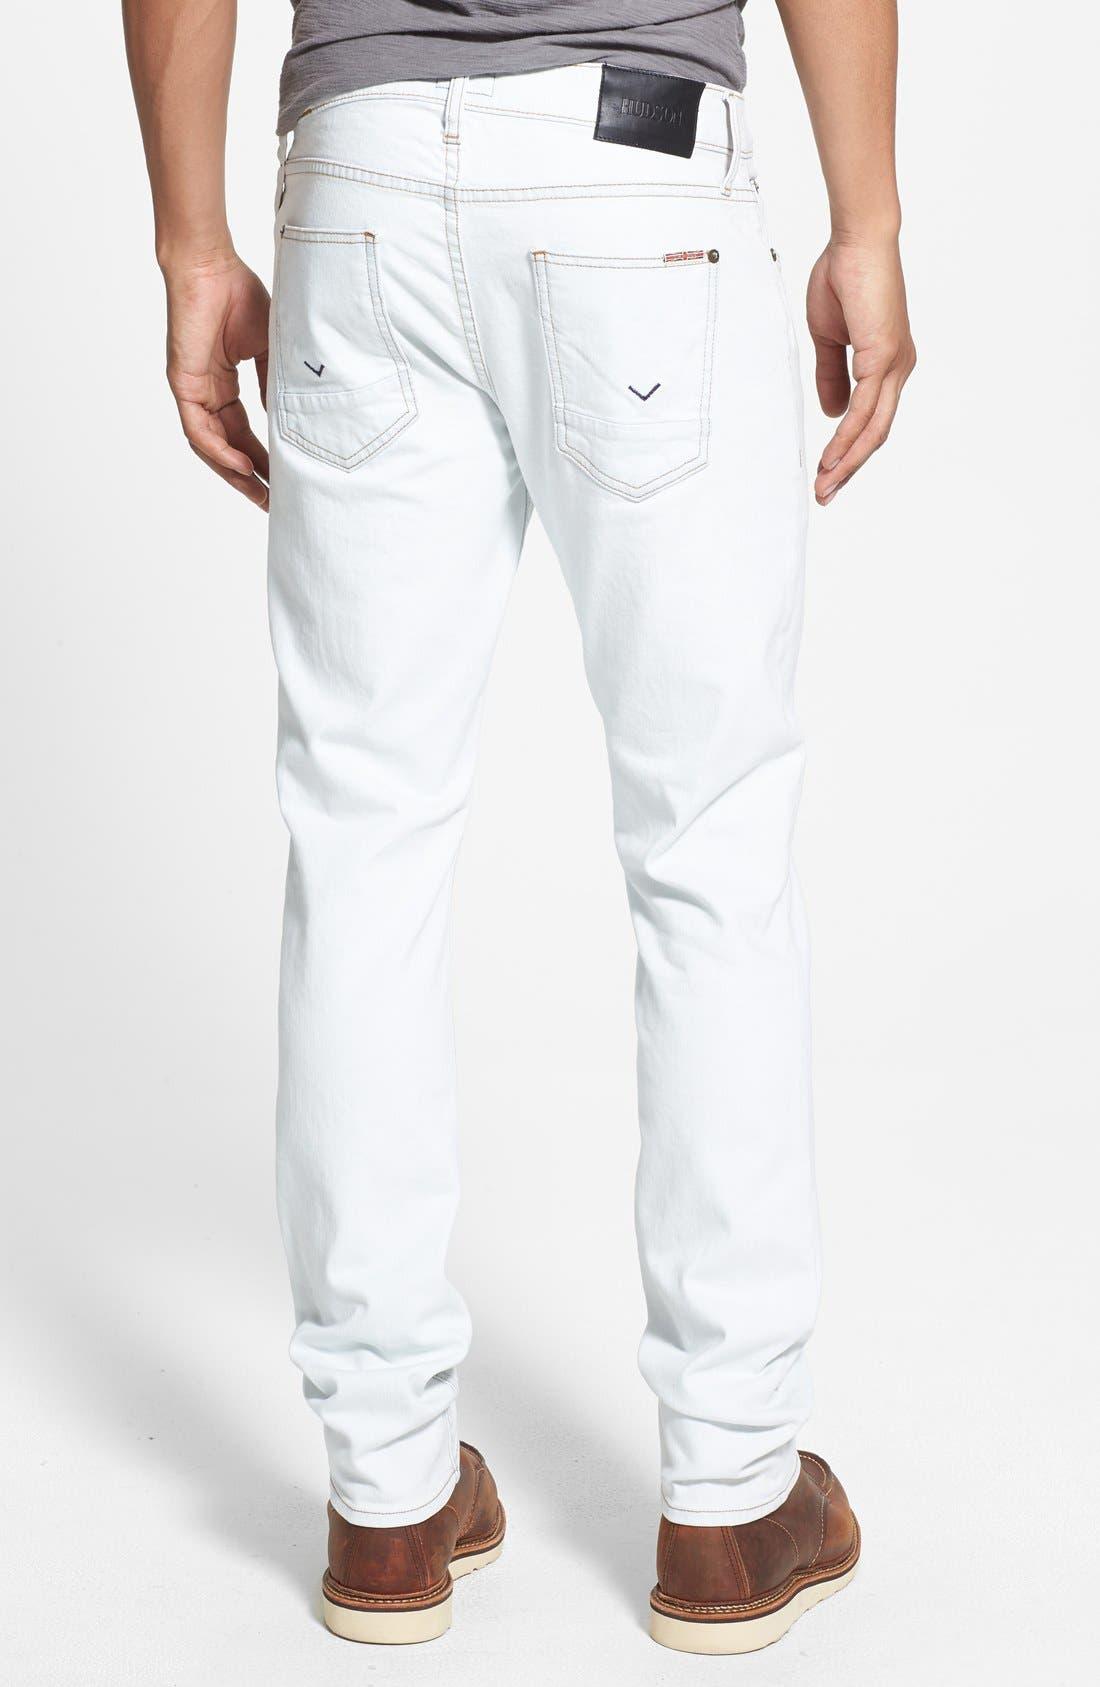 Alternate Image 2  - Hudson Jeans 'Sartor' Slouchy Skinny Fit Jeans (Flashback)